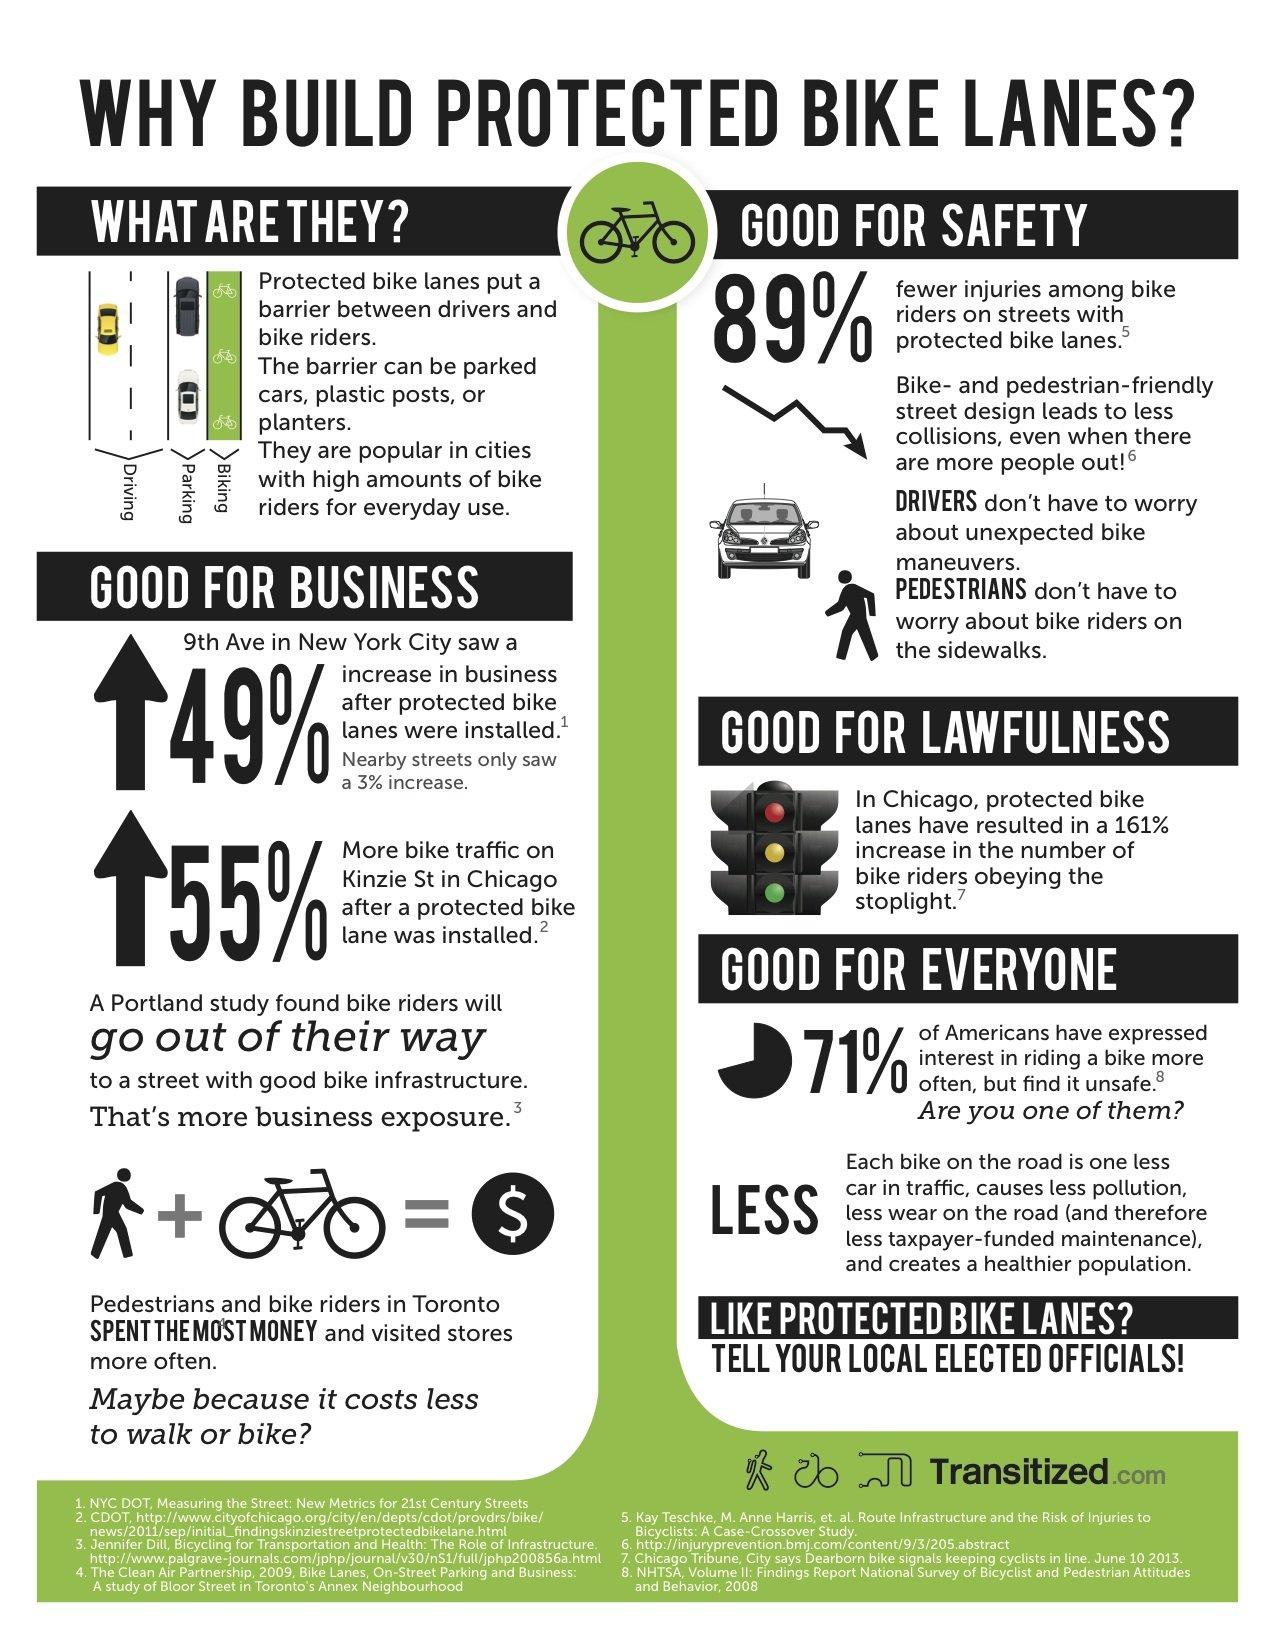 Benefits of Protected Bike Lanes